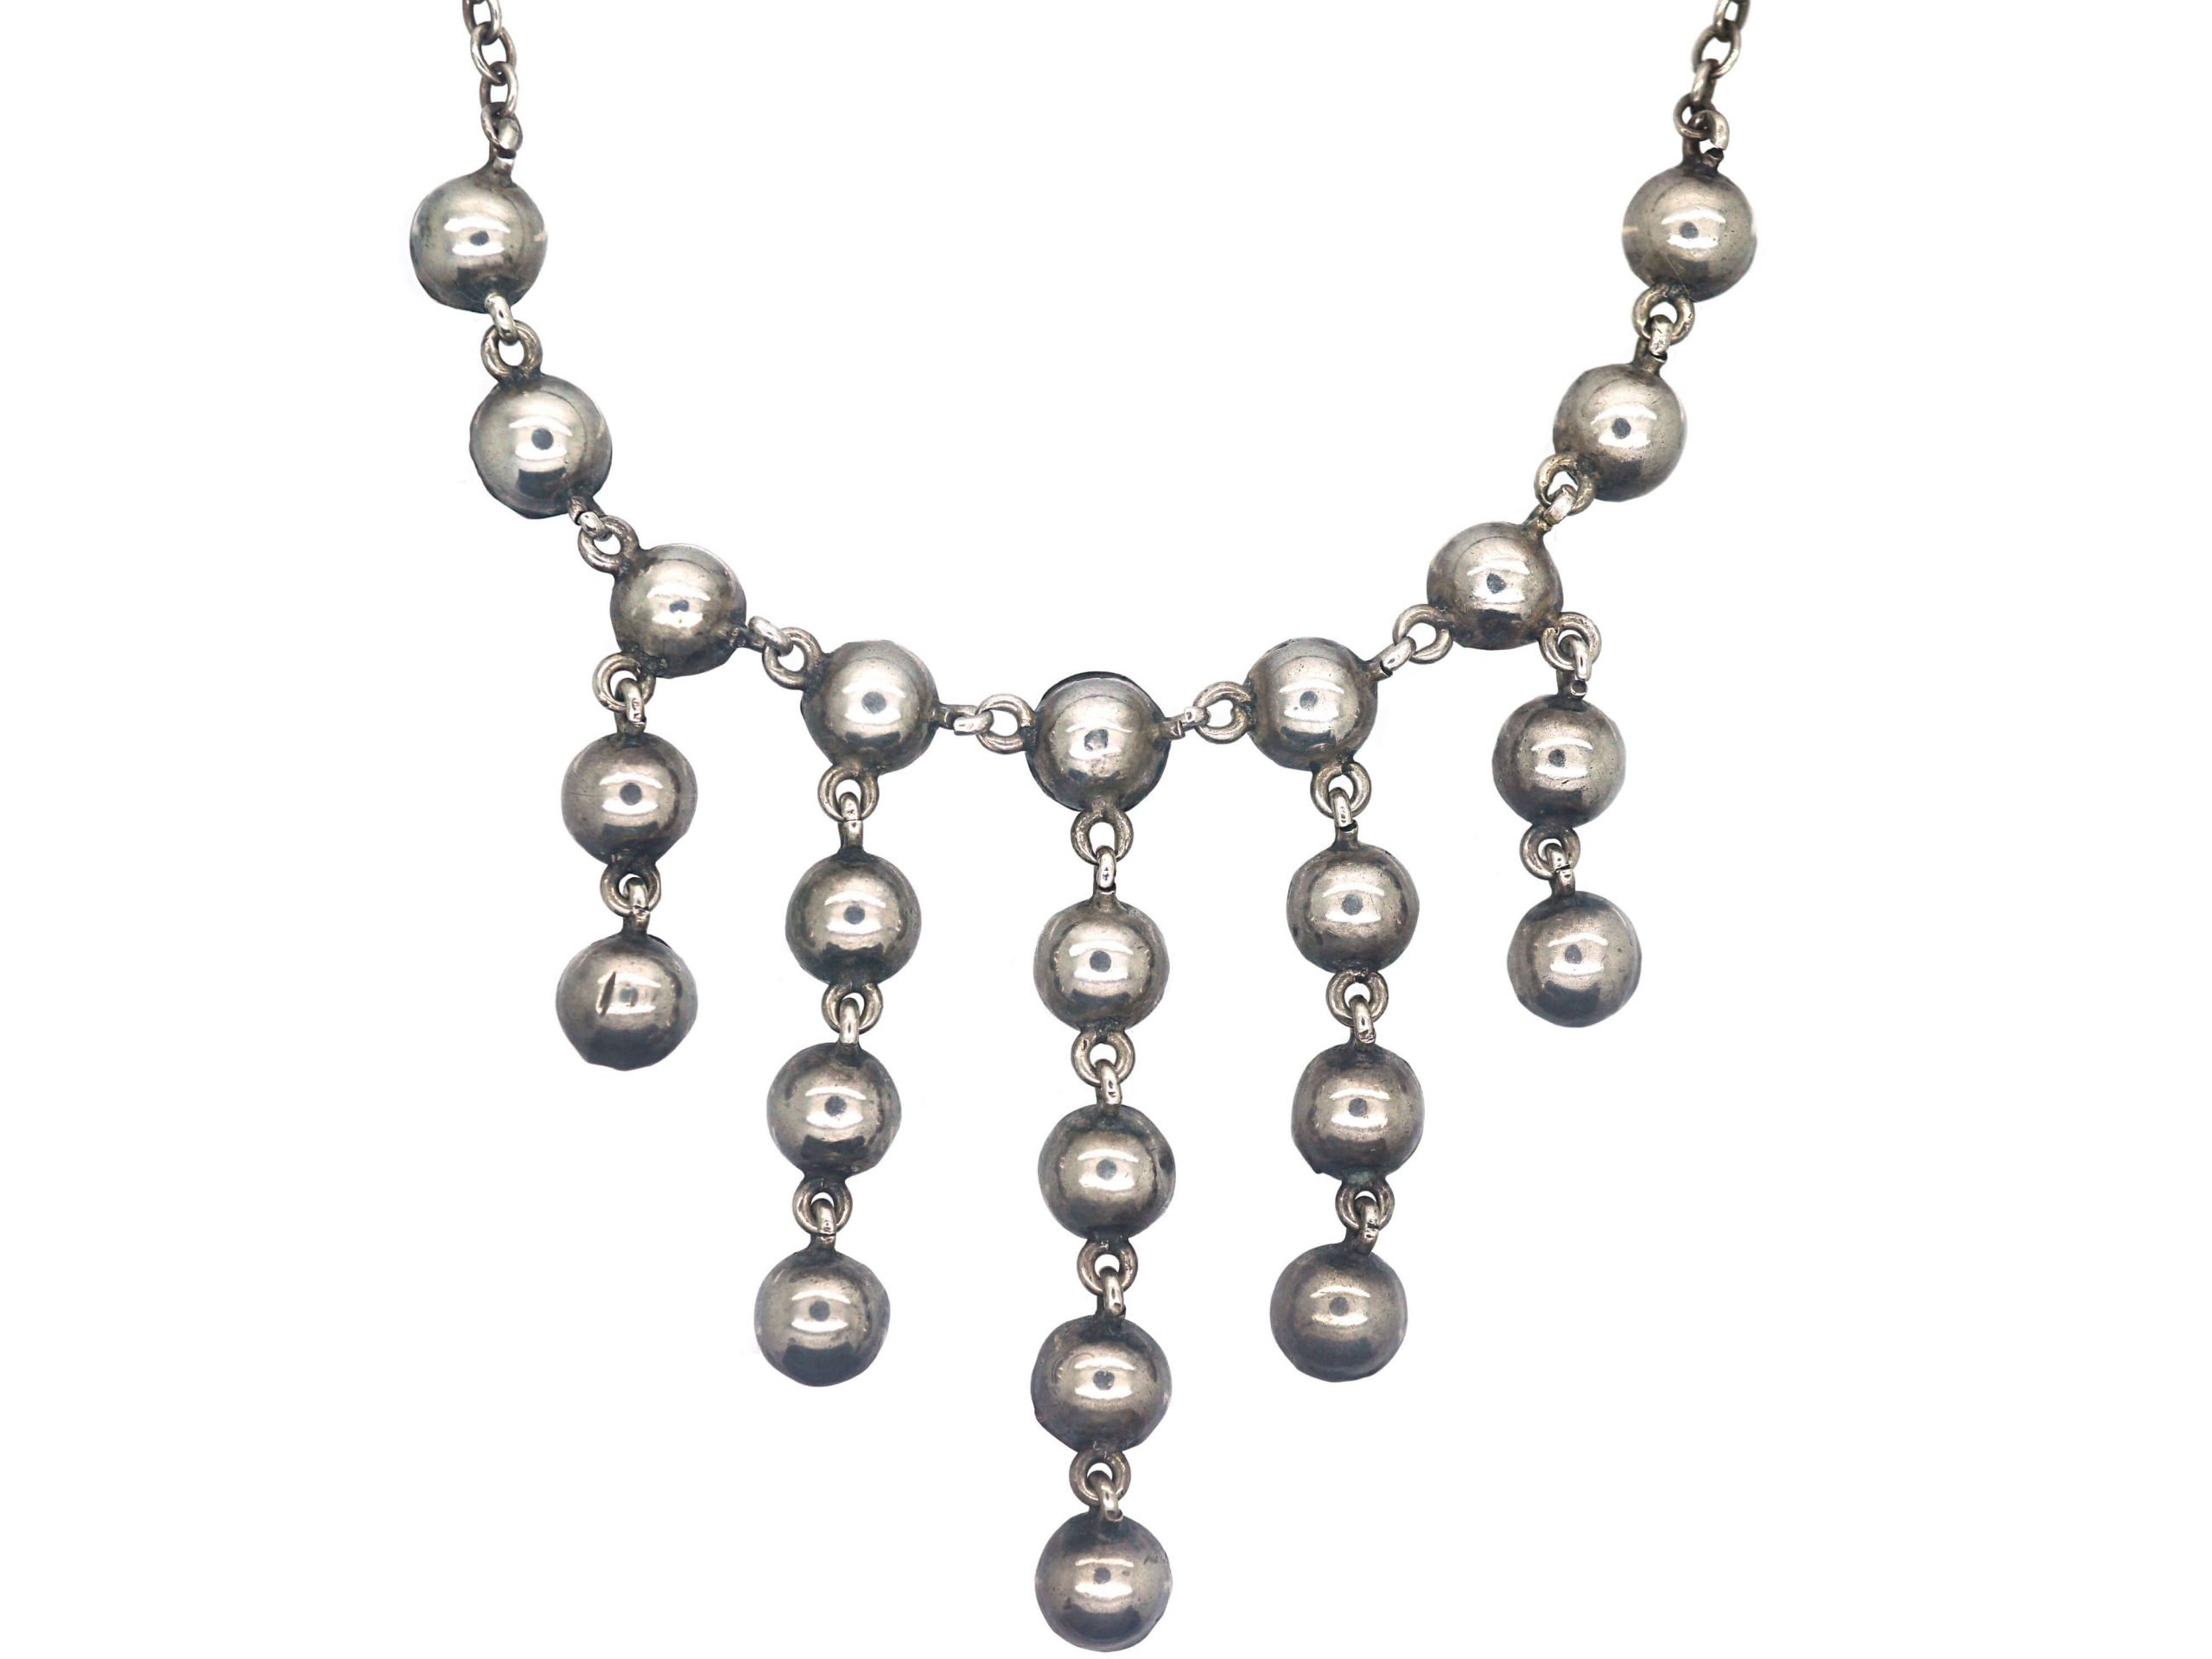 Edwardian Silver & Green Paste Drops Necklace